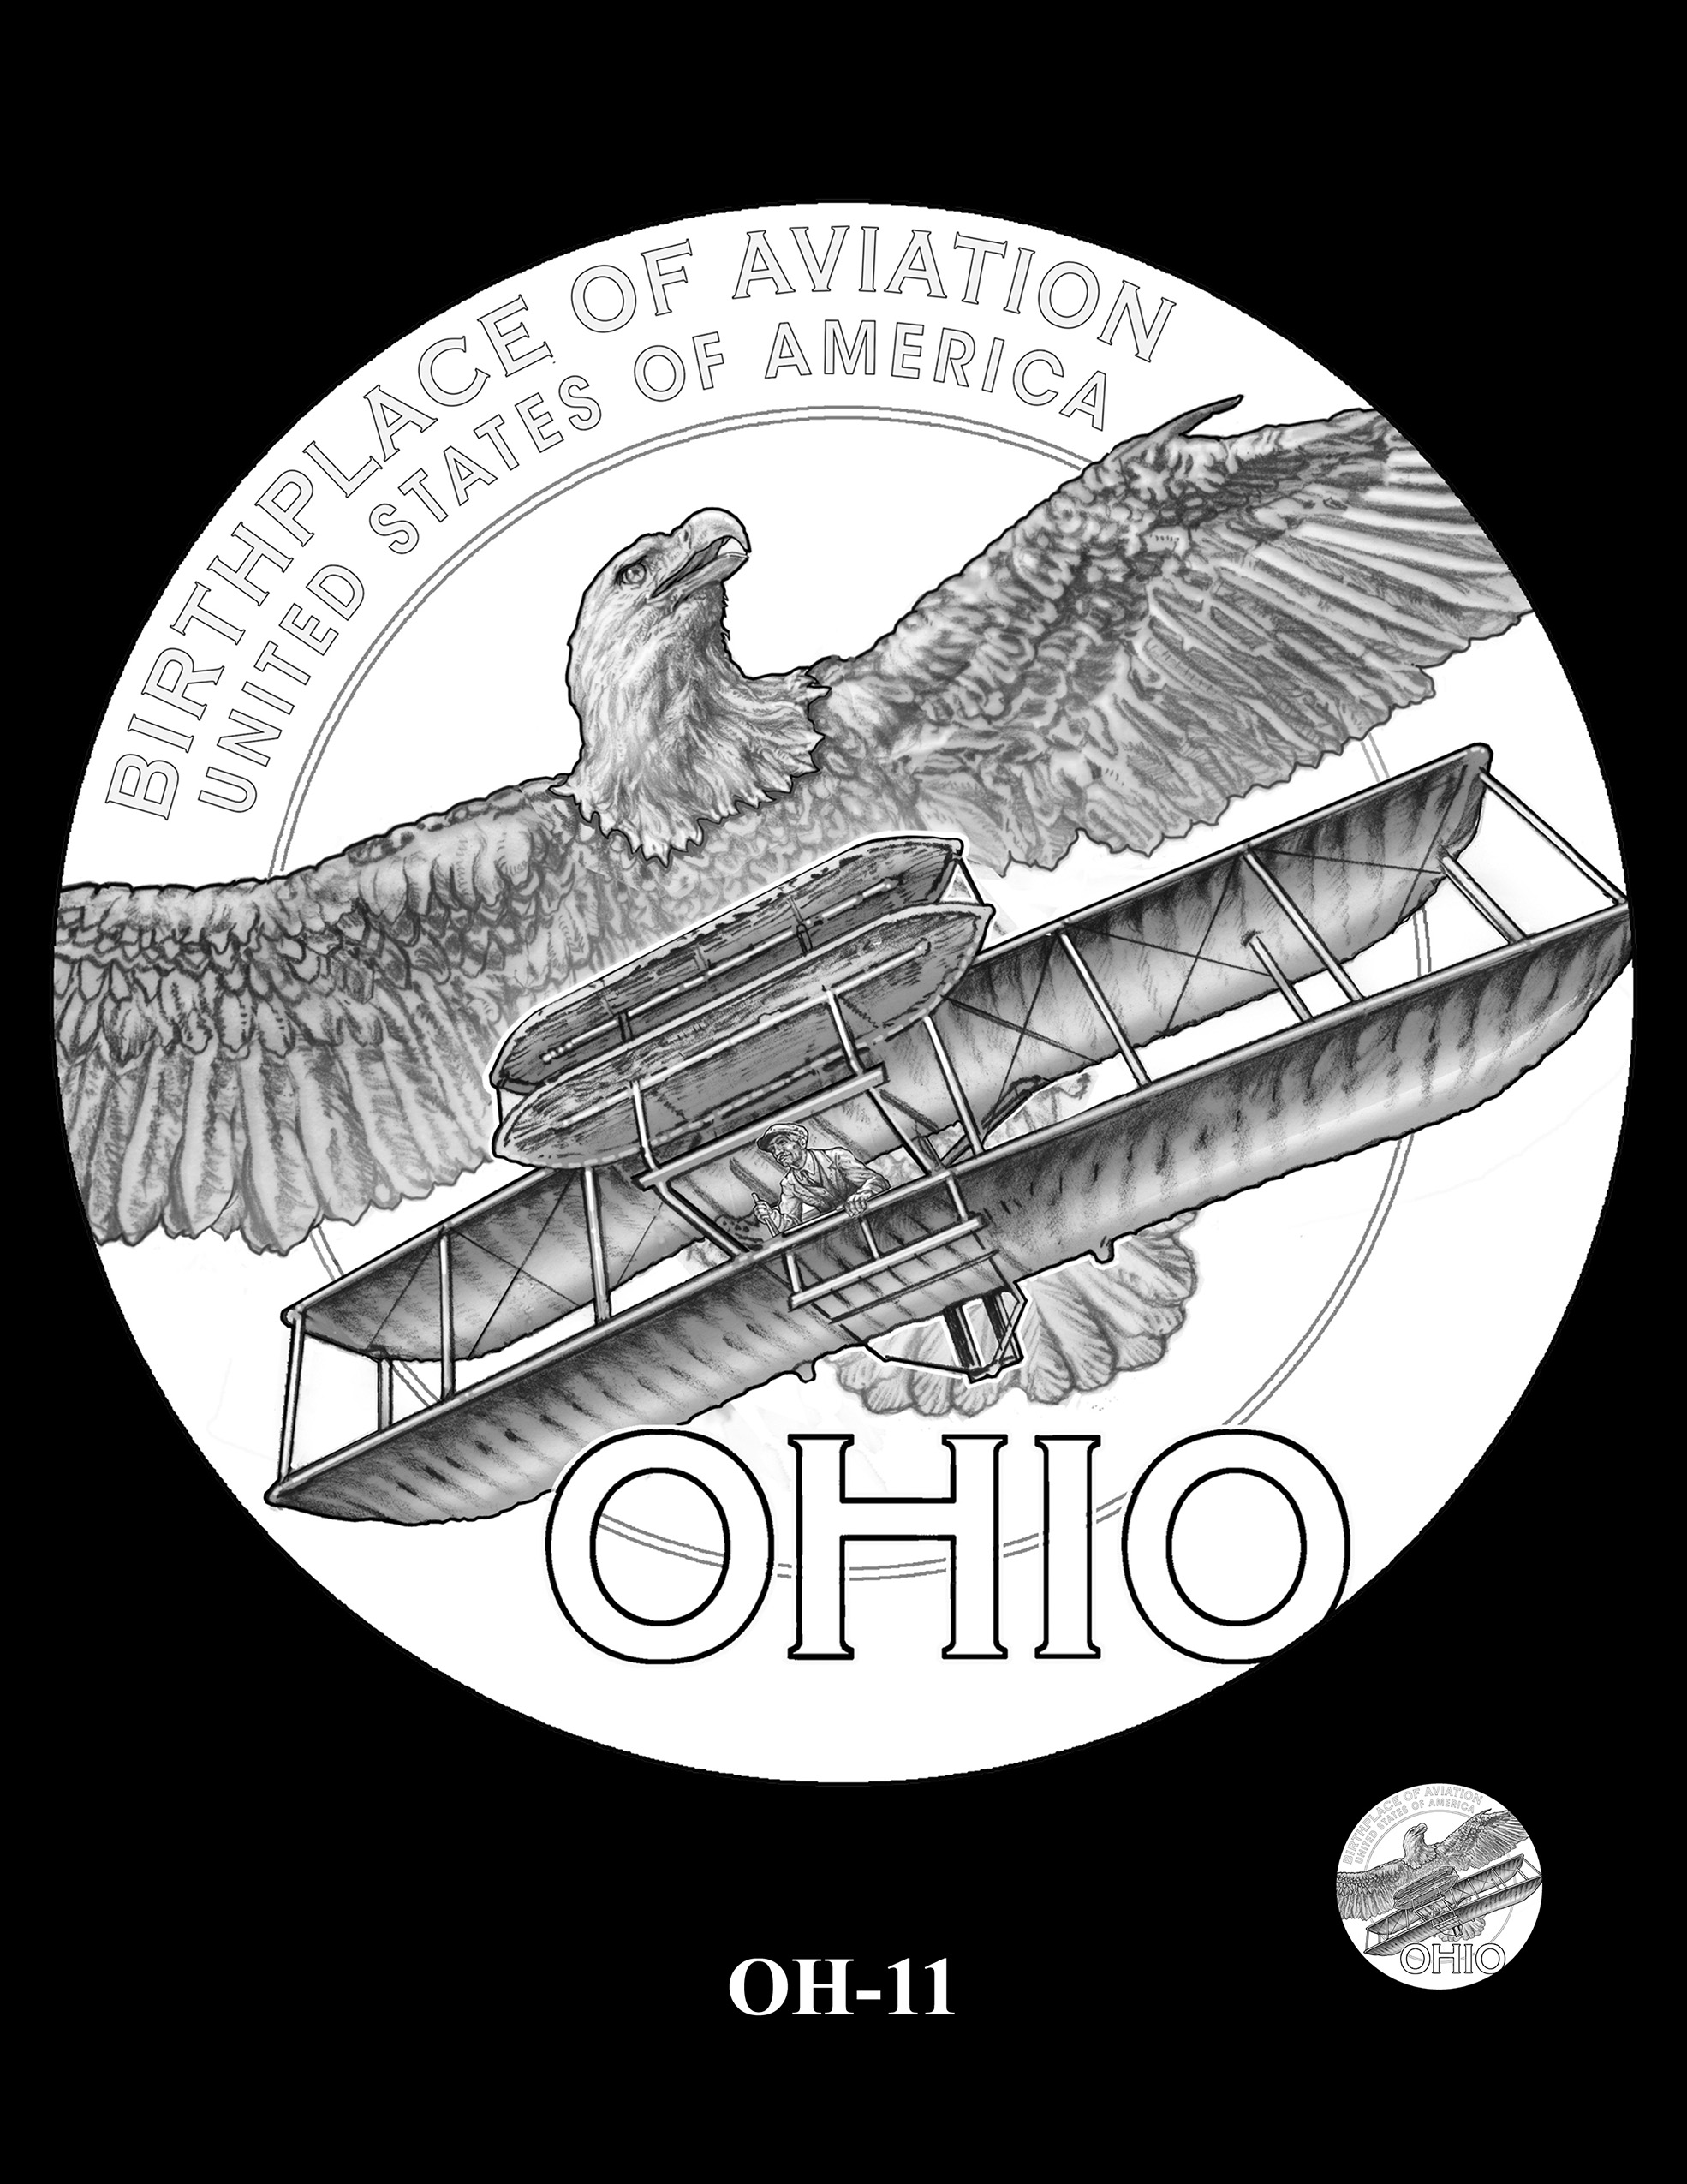 OH-11 -- 2023 American Innovation $1 Coin Program - Ohio